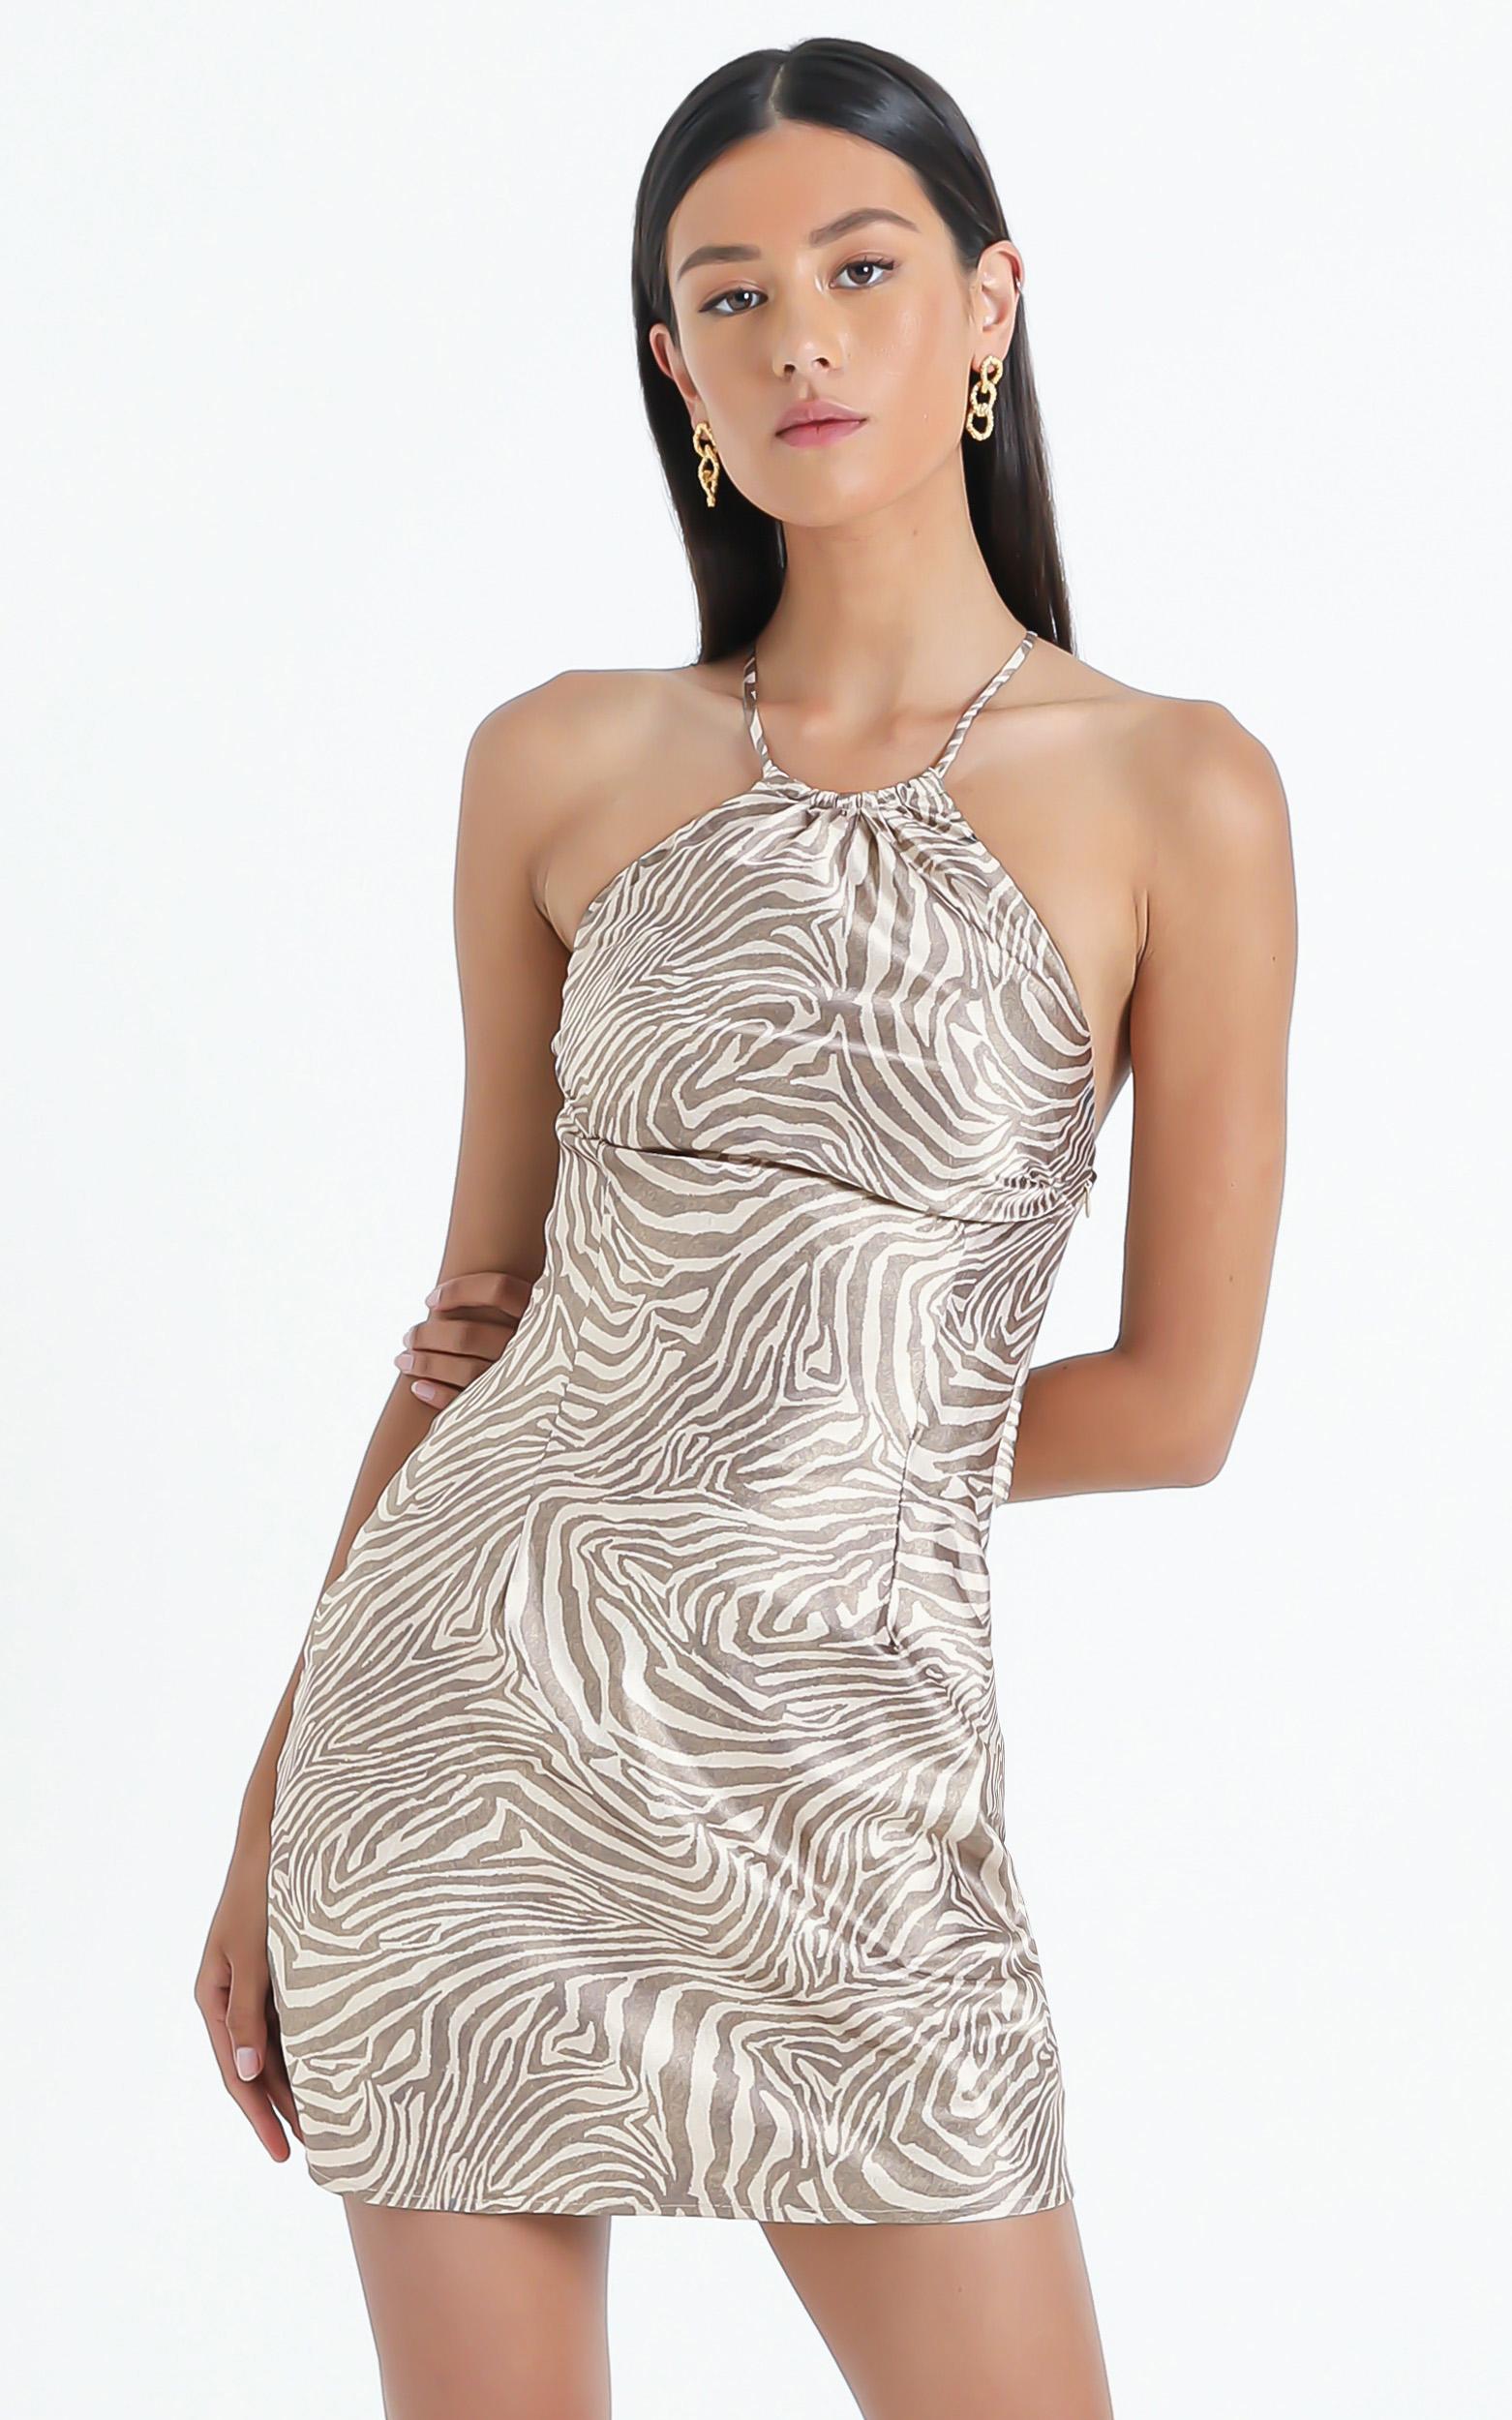 Odine Dress in Zebra - 6 (XS), BLK1, hi-res image number null